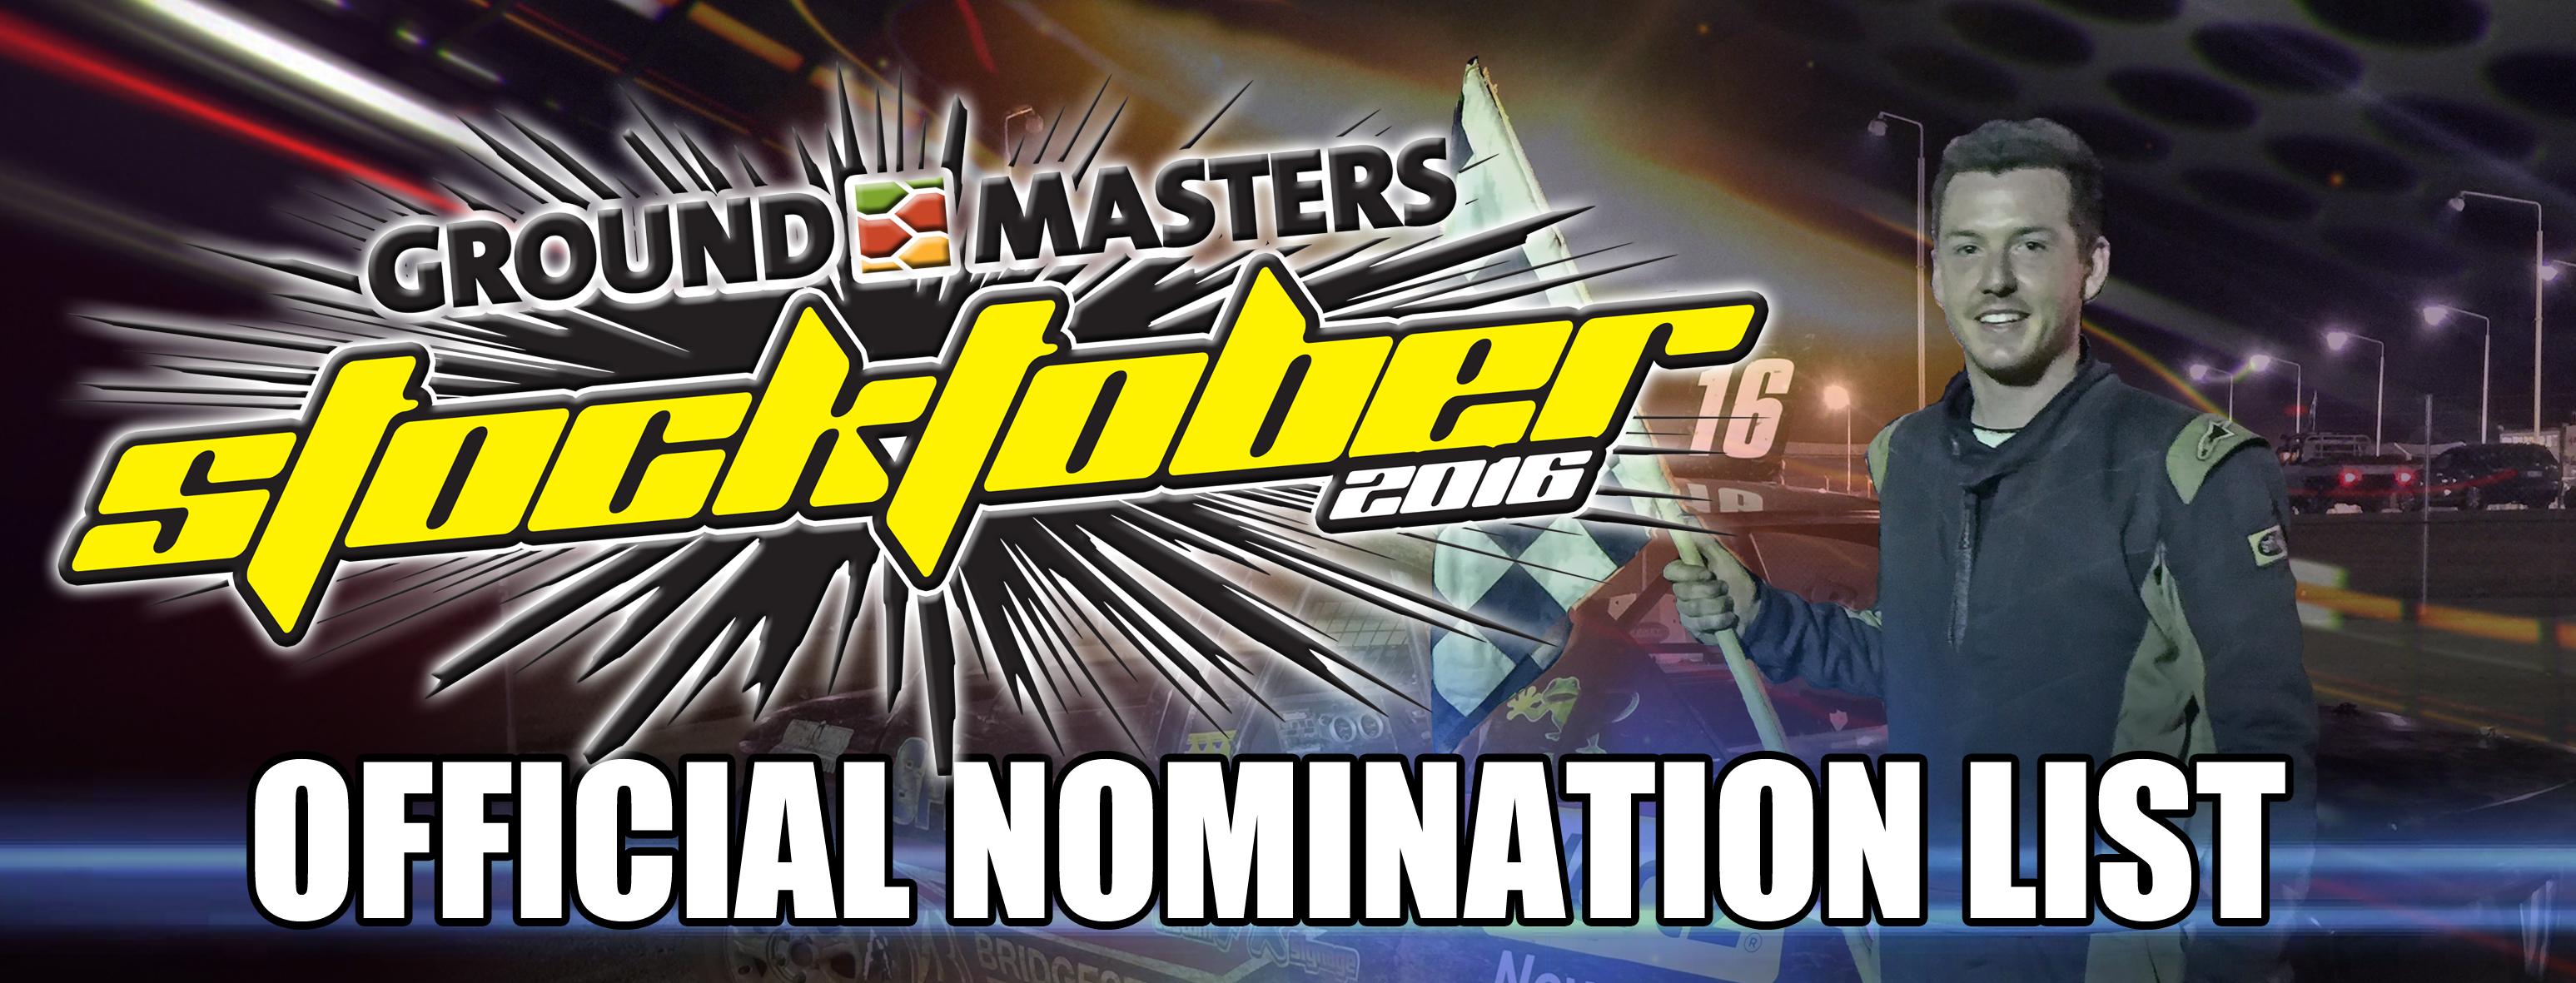 official-nomination-list-stocktober